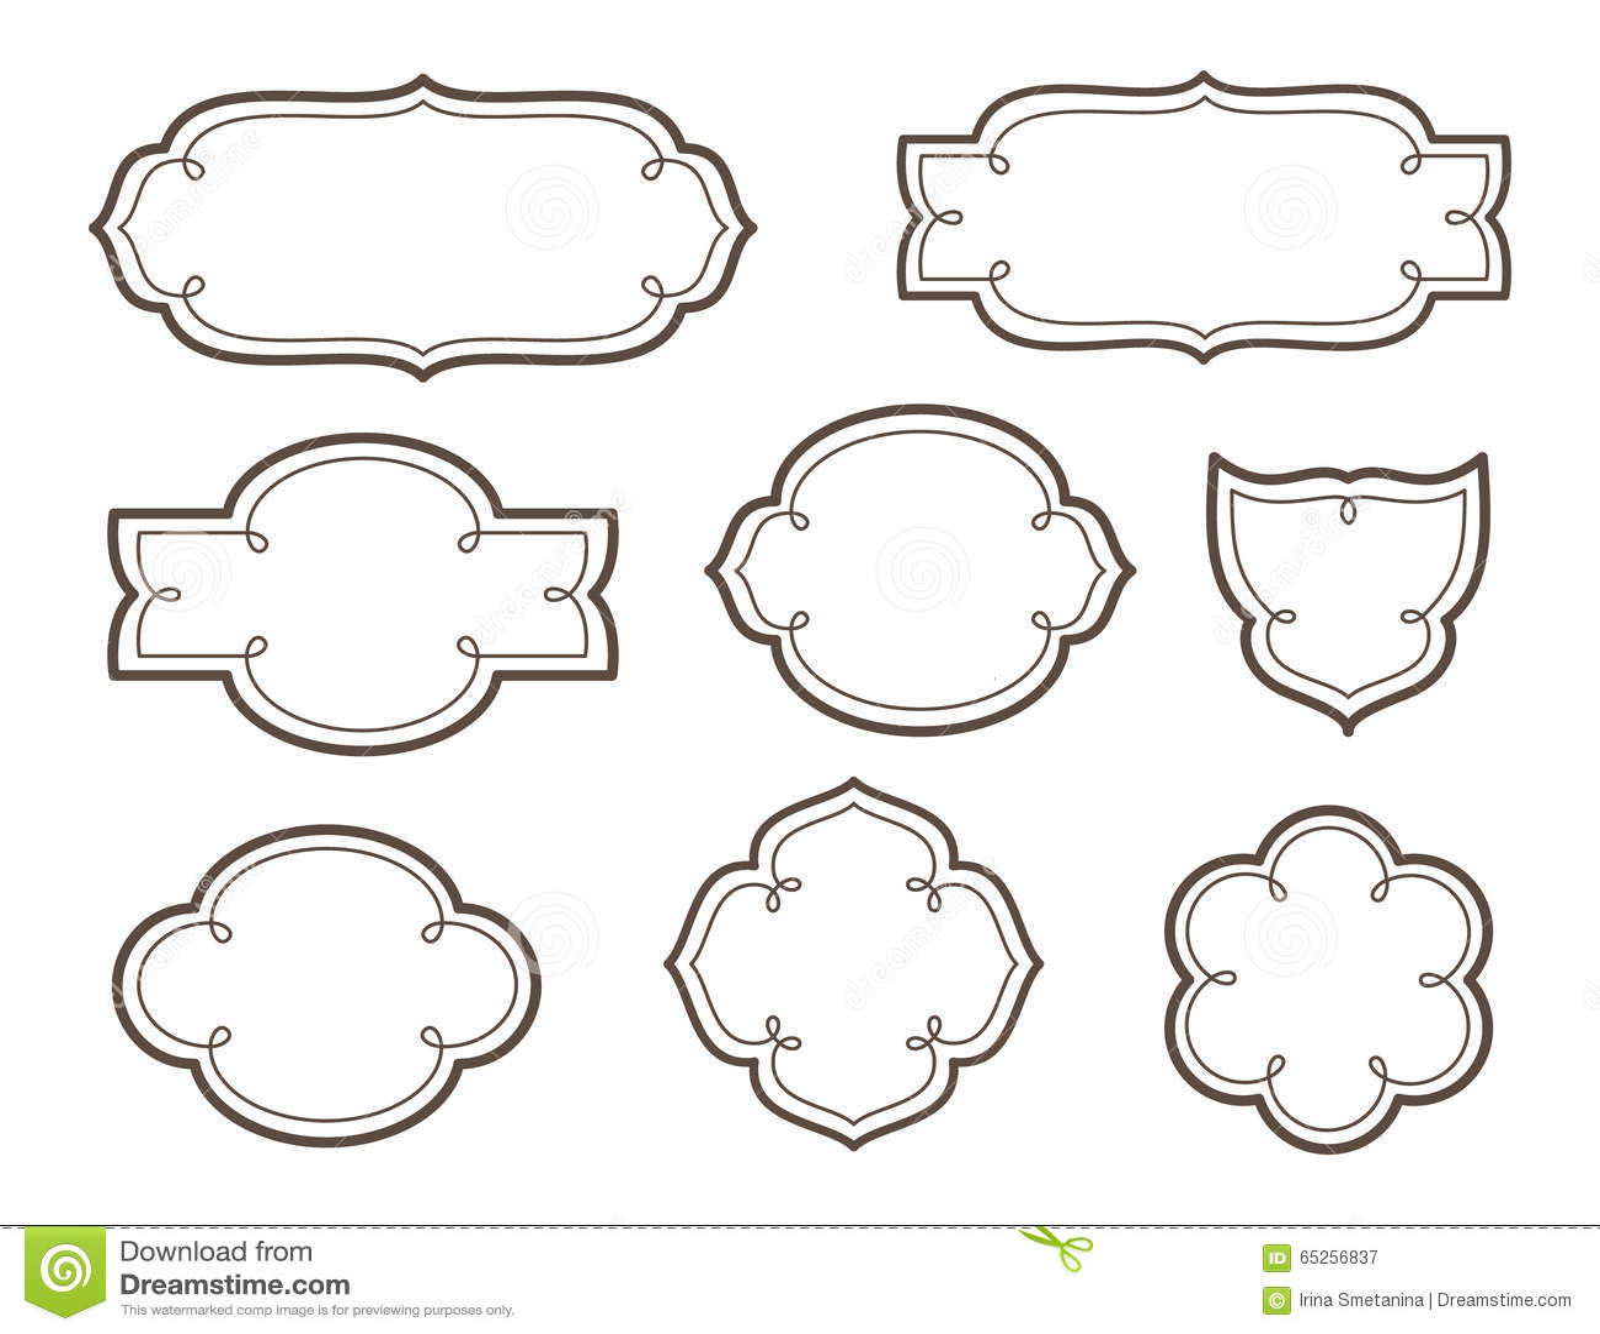 Vector Decorative Frames For Logos And Names Stock Vector